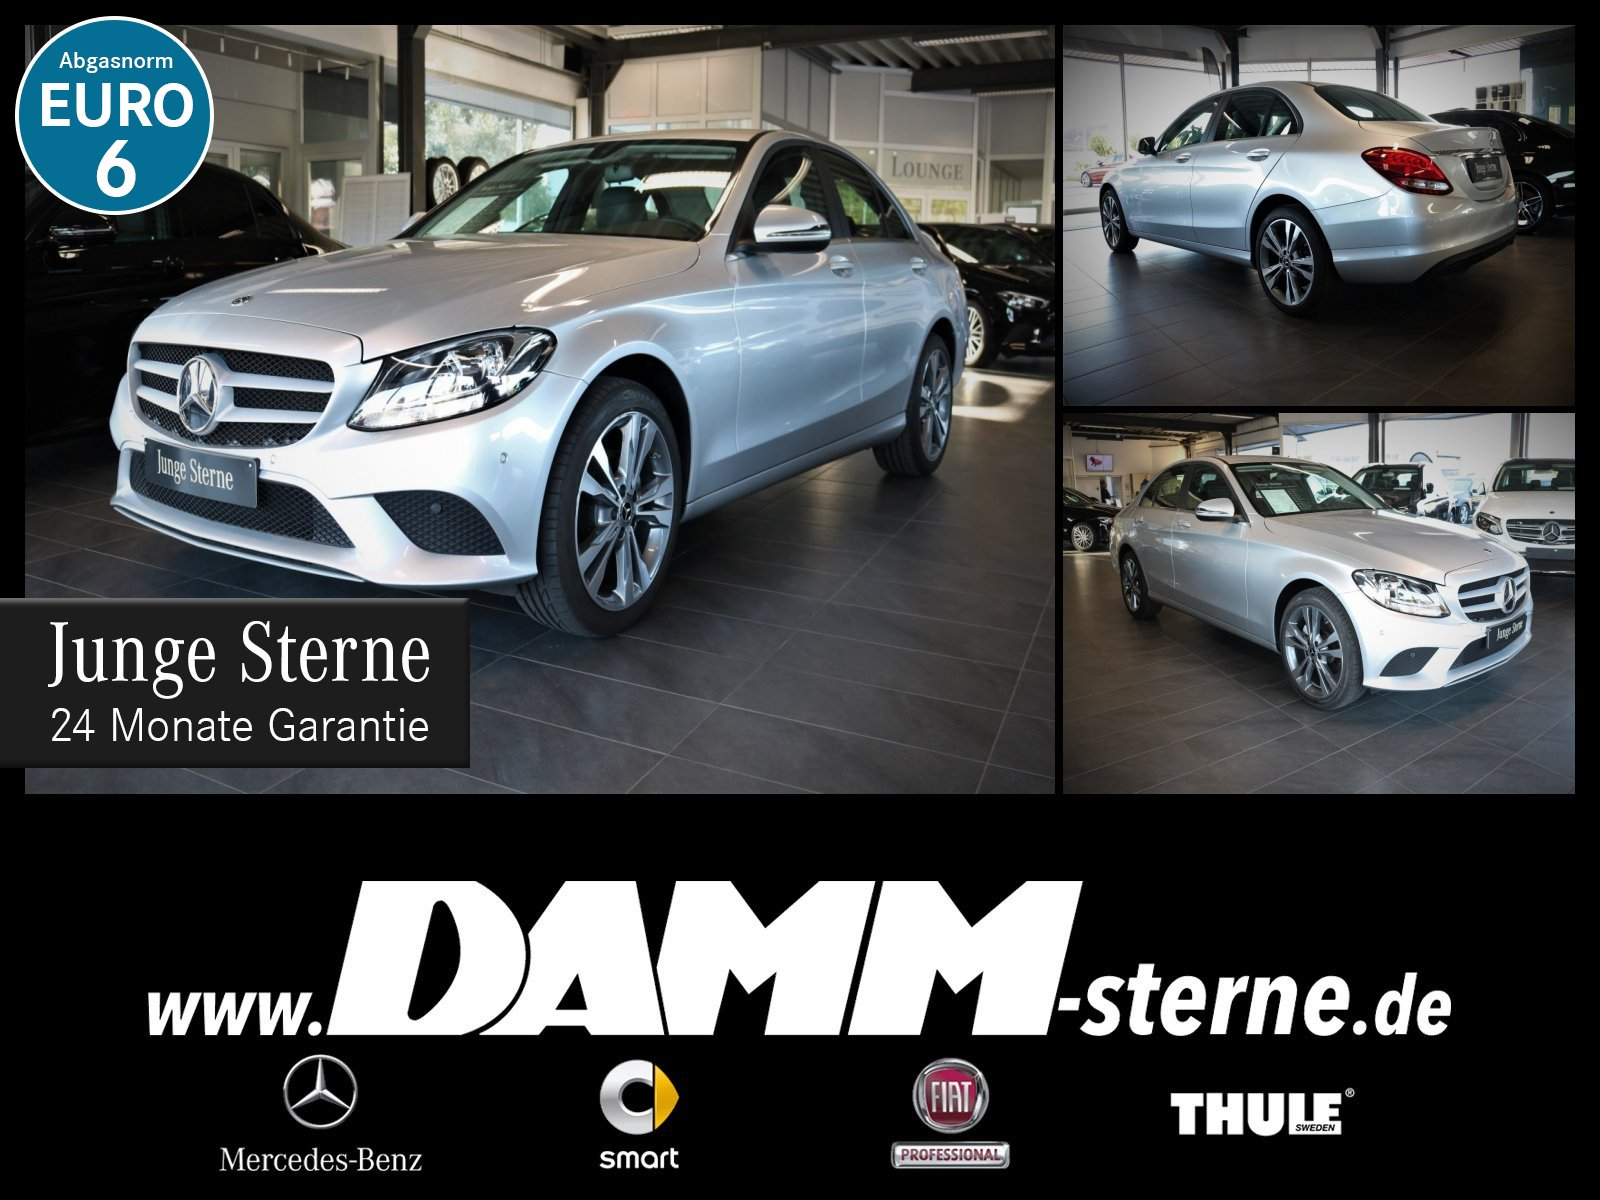 Mercedes-Benz C 160 Navi/Leder/SHZ/Kamera/LMR 18 Zoll/Facelift, Jahr 2017, Benzin